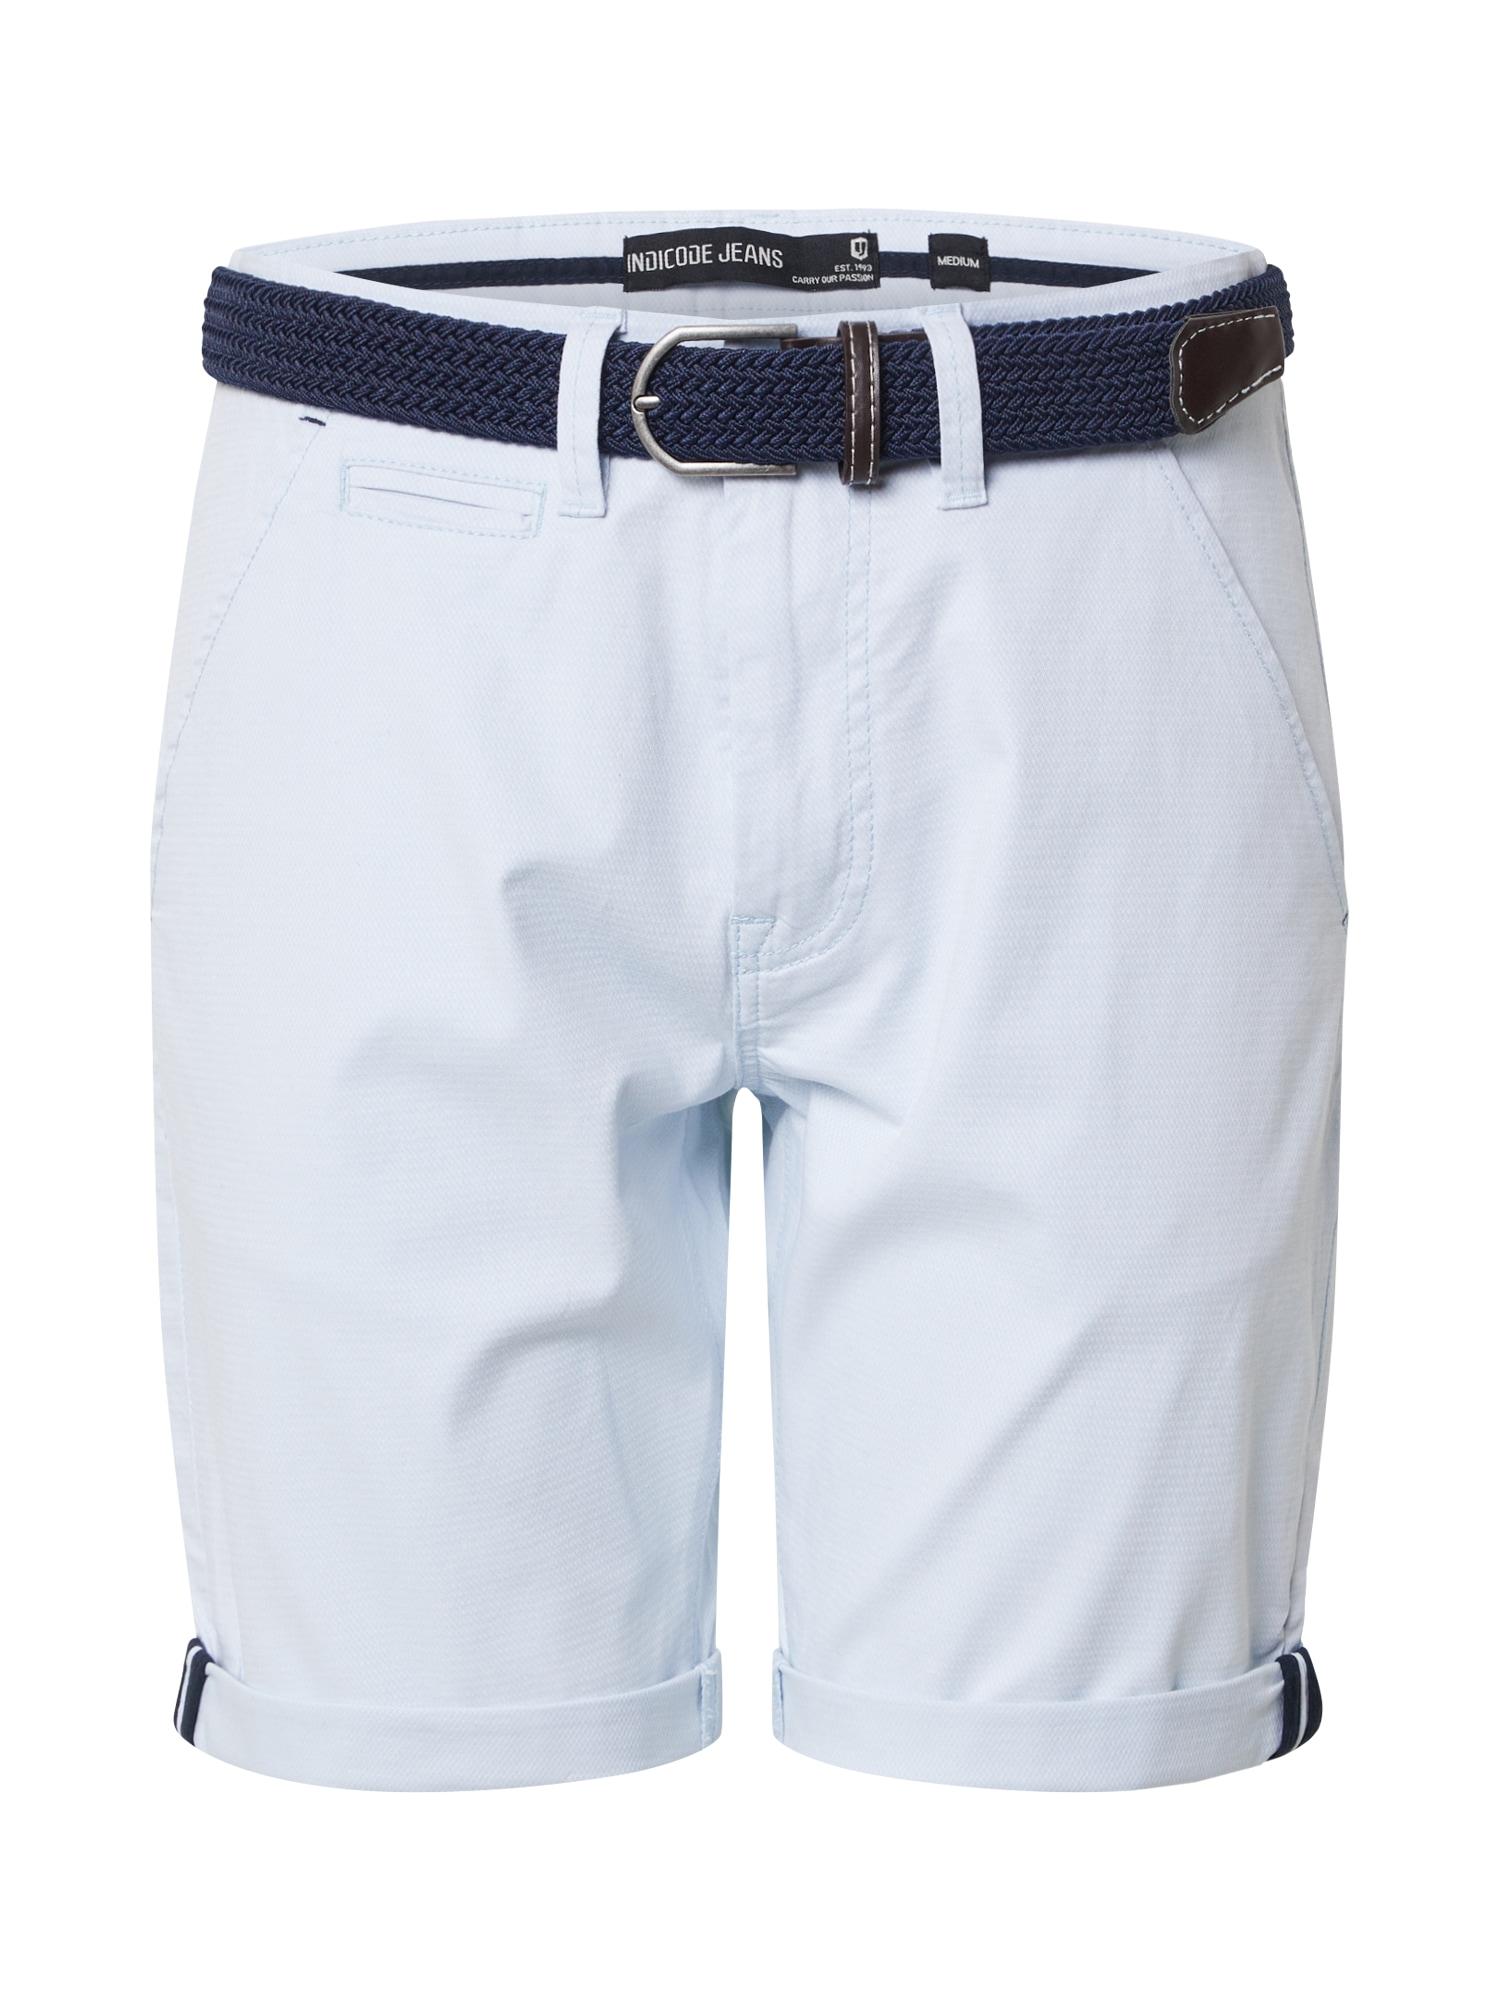 INDICODE JEANS Chino stiliaus kelnės 'Dignum' mėlyna